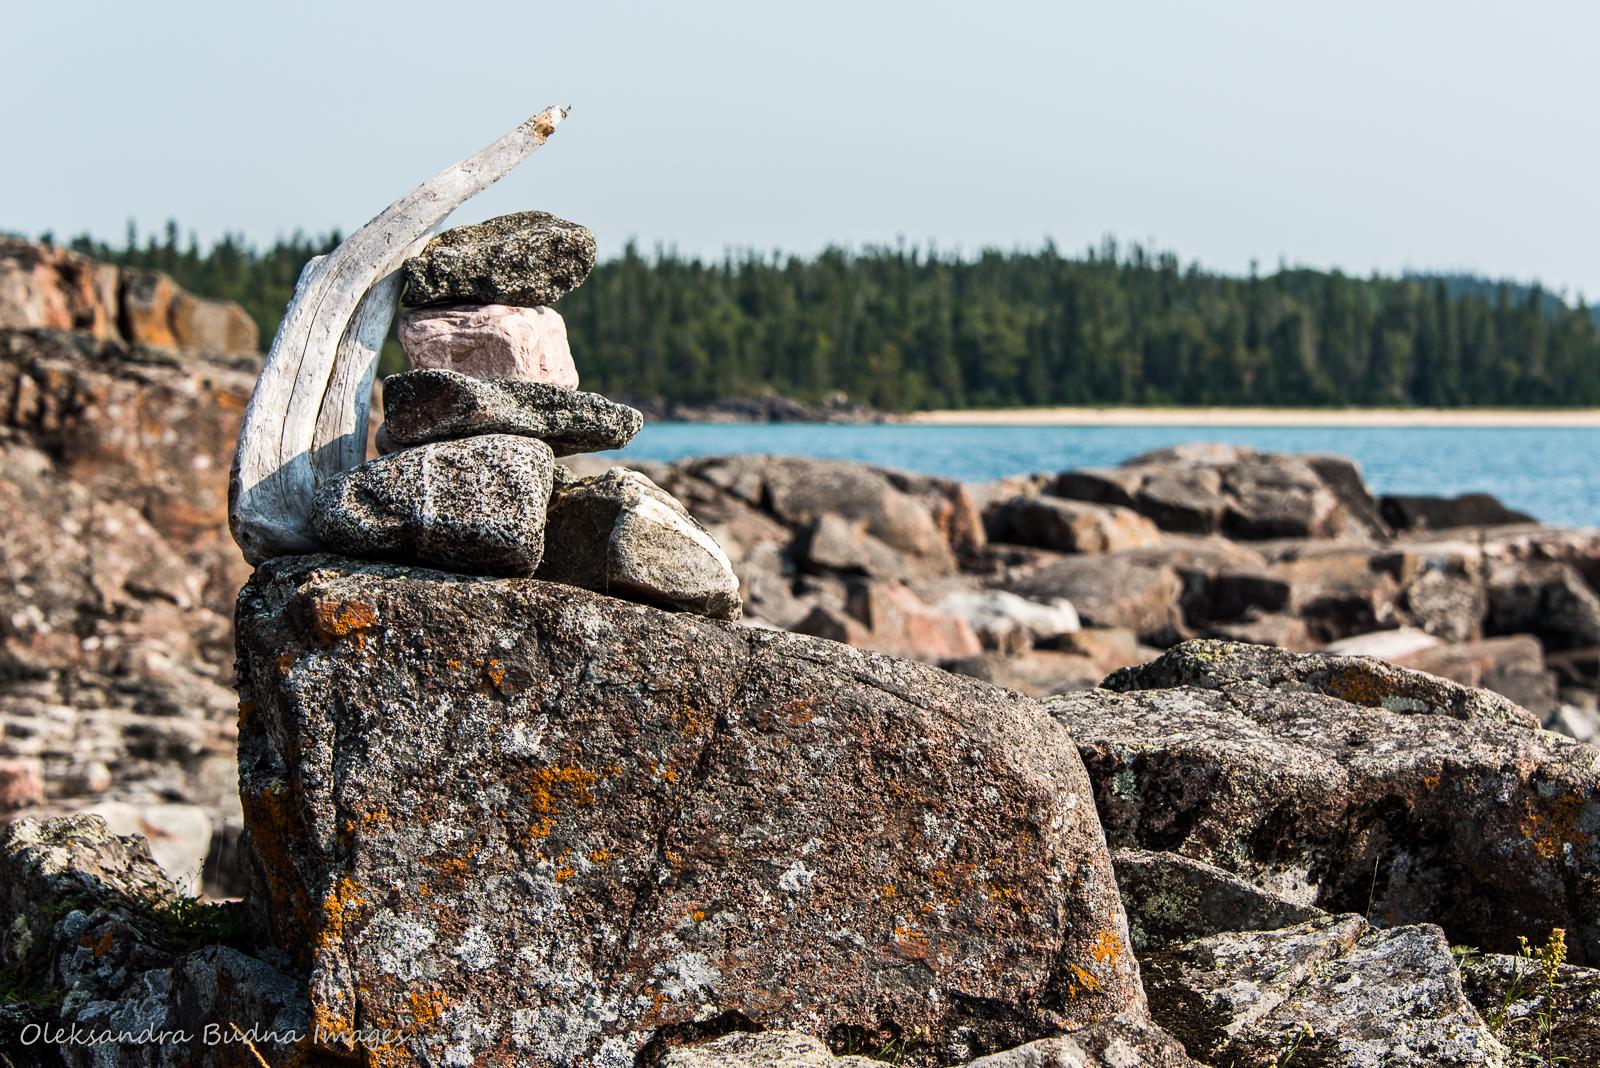 Rock cairn on Coastal Hiking Trail in Pukaskwa